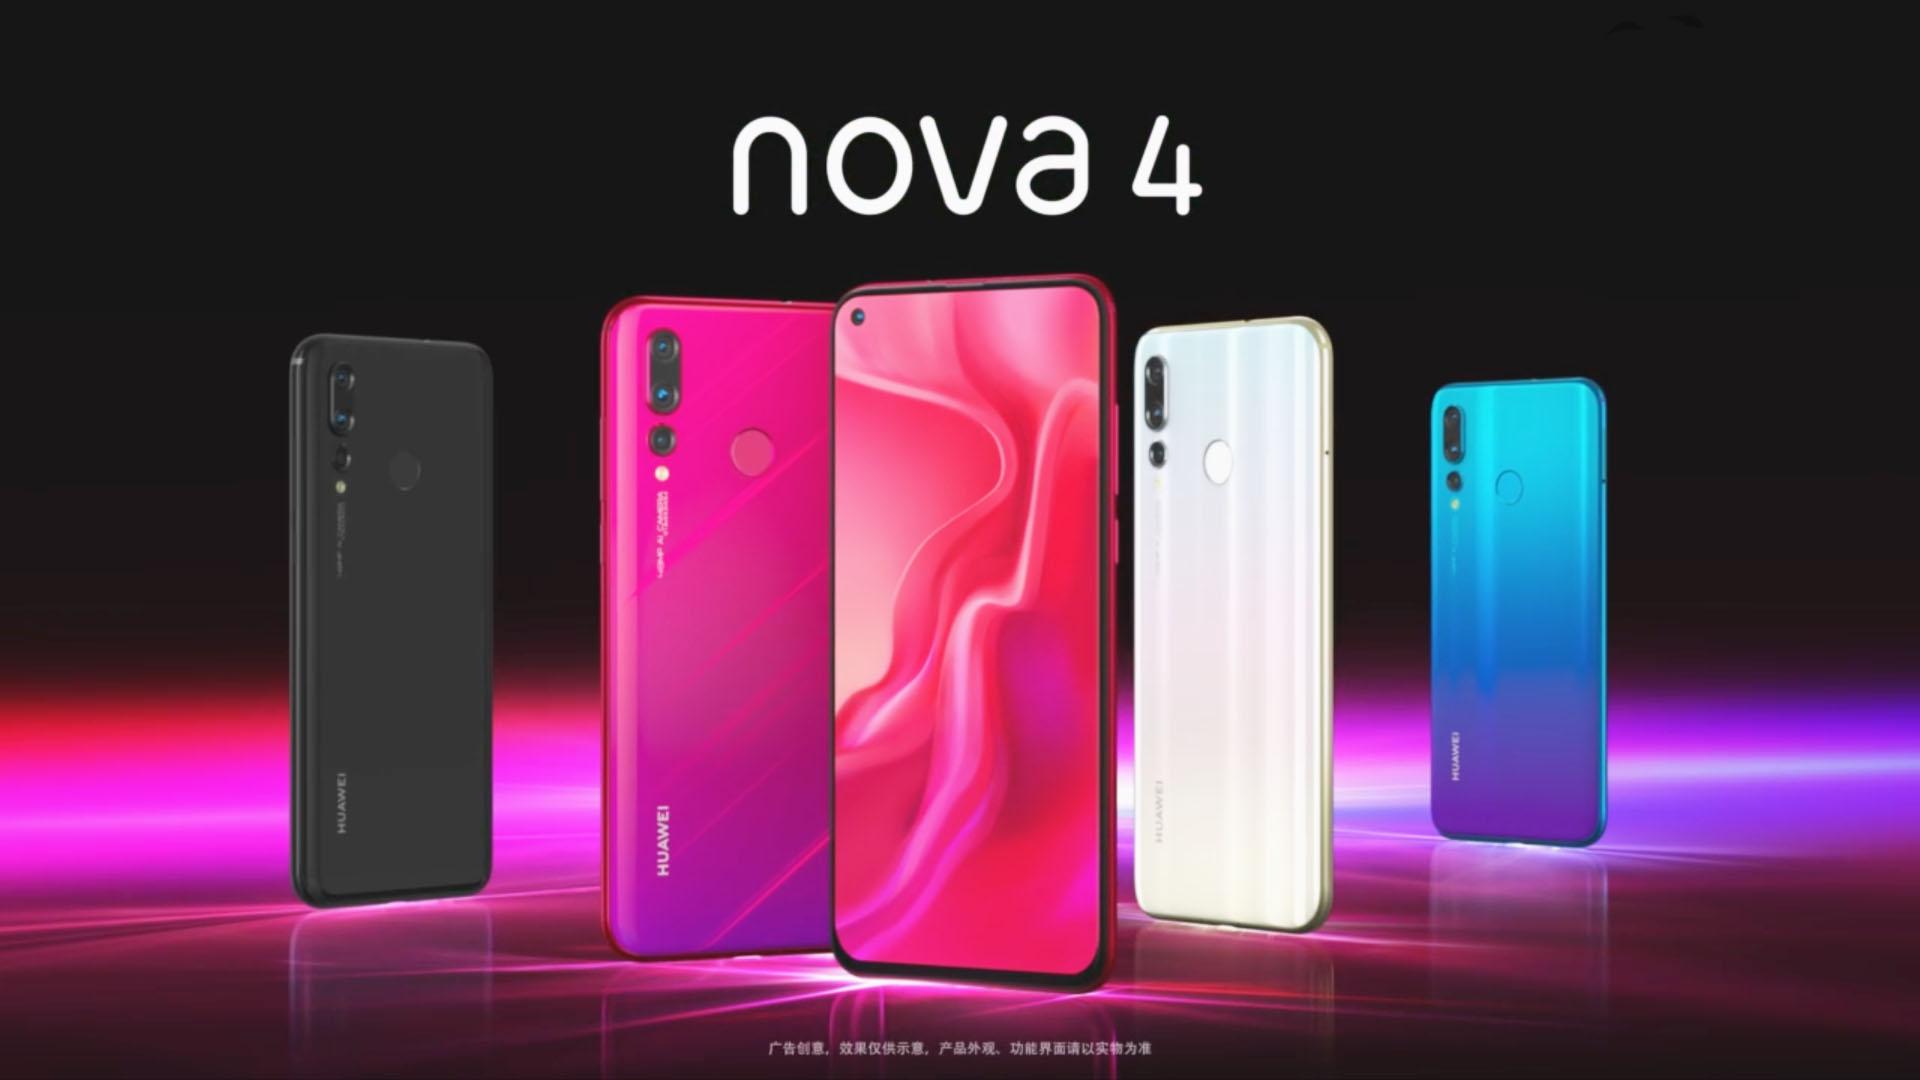 سعر و مواصفات هواوي الجديد Huawei Nova 4